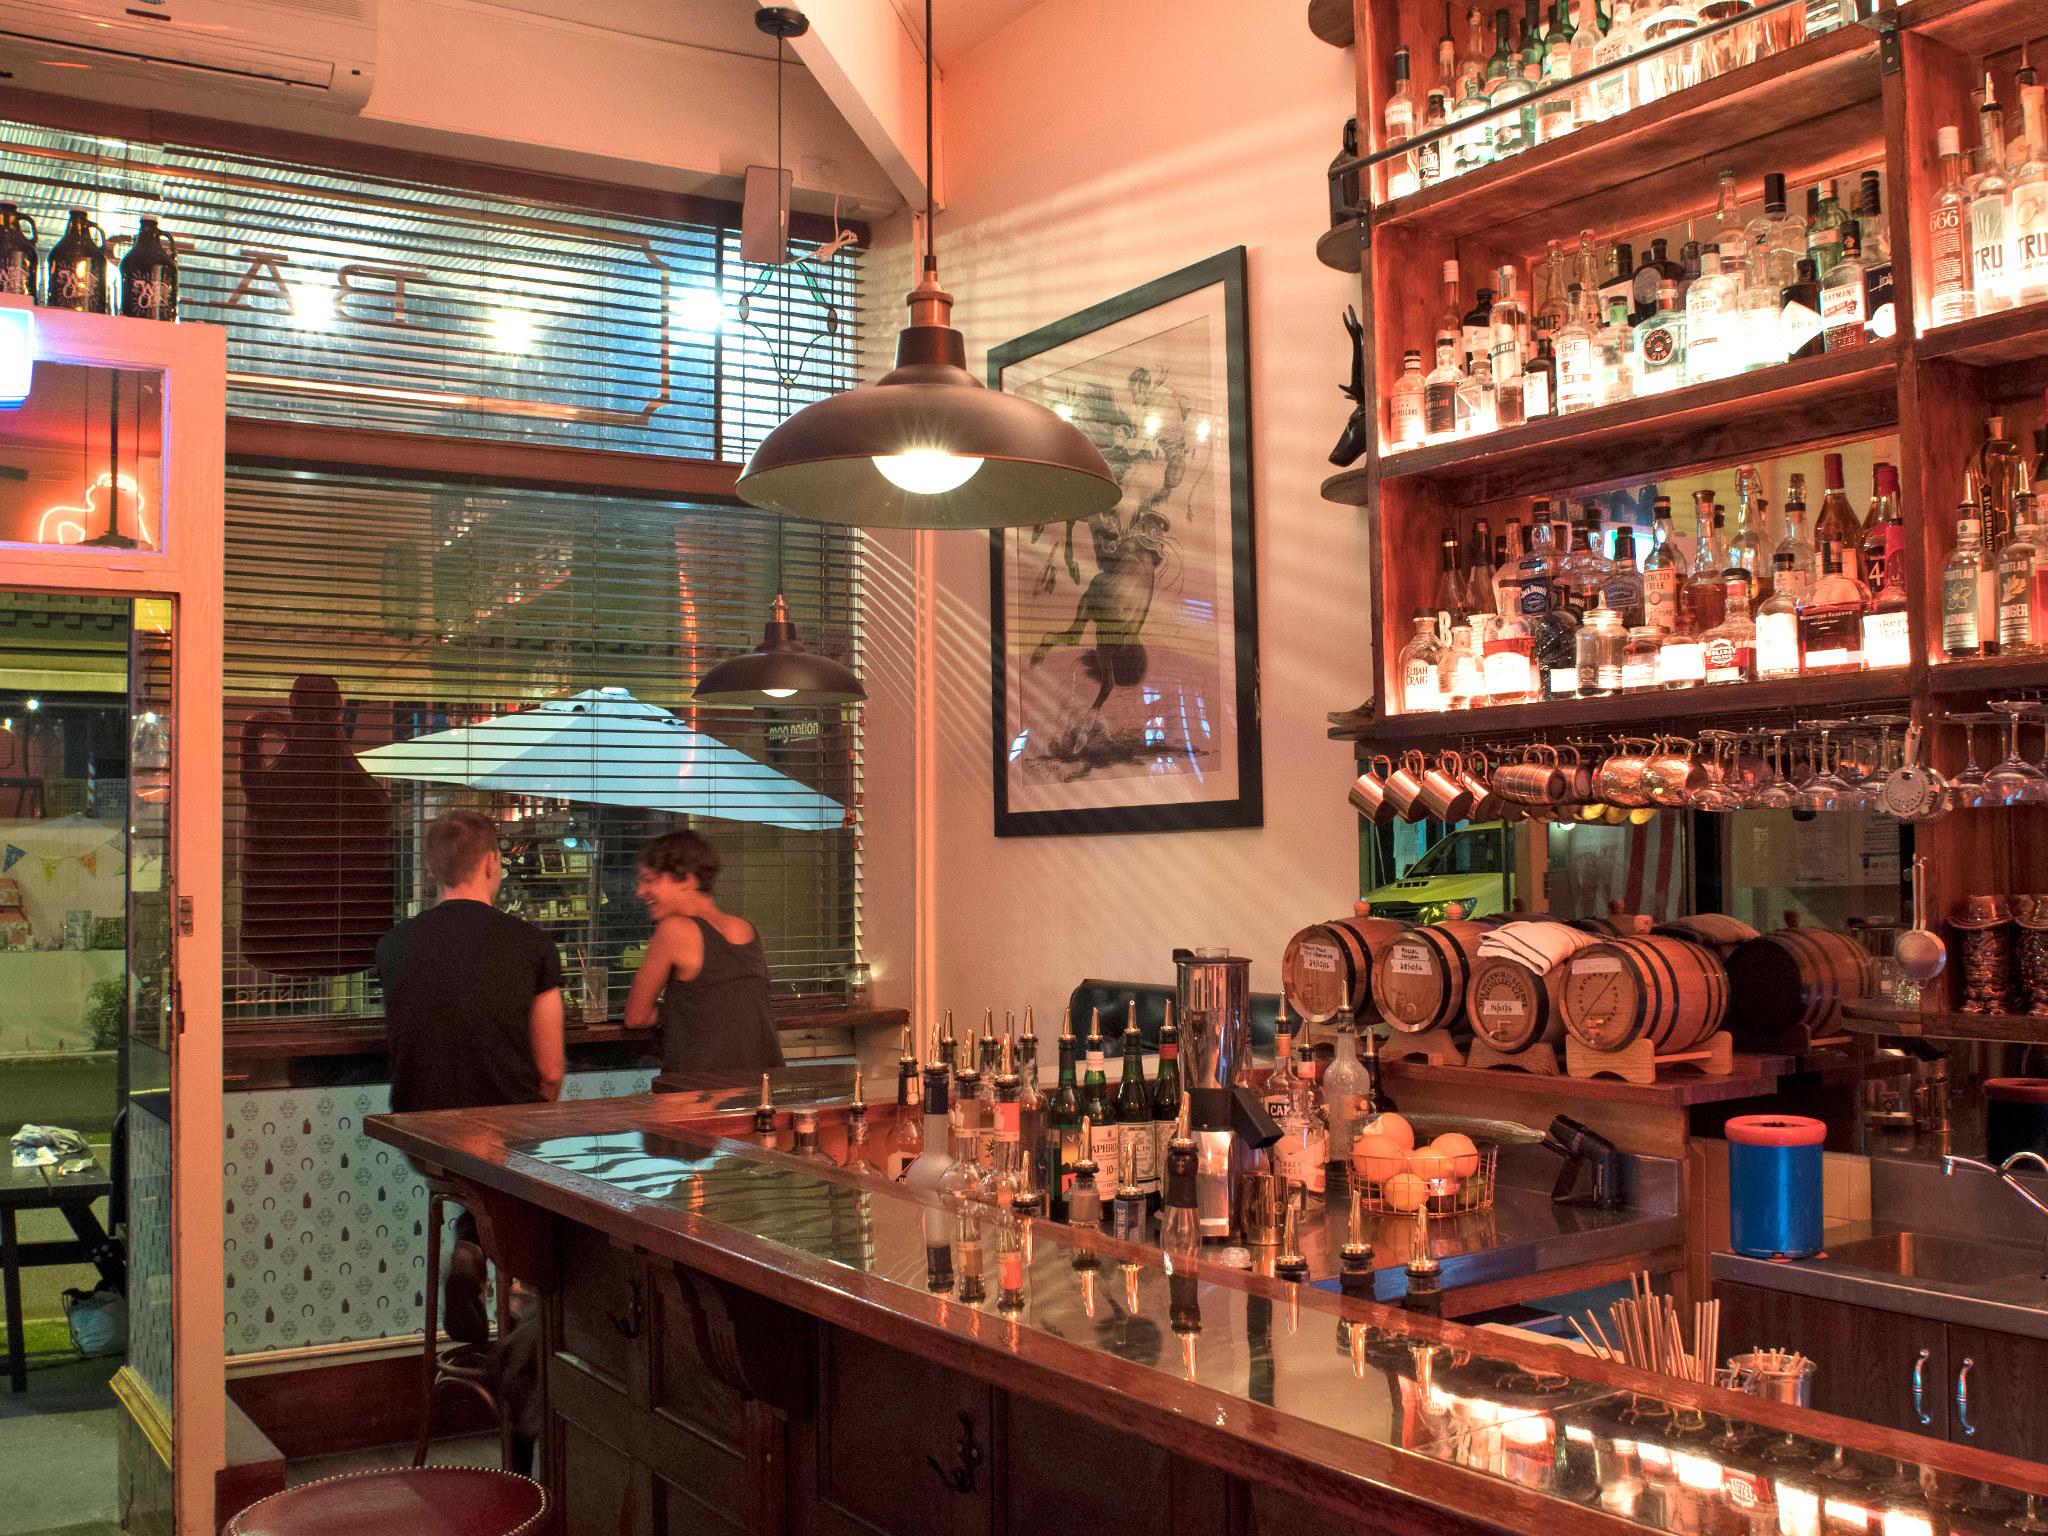 White Oaks Saloon customers